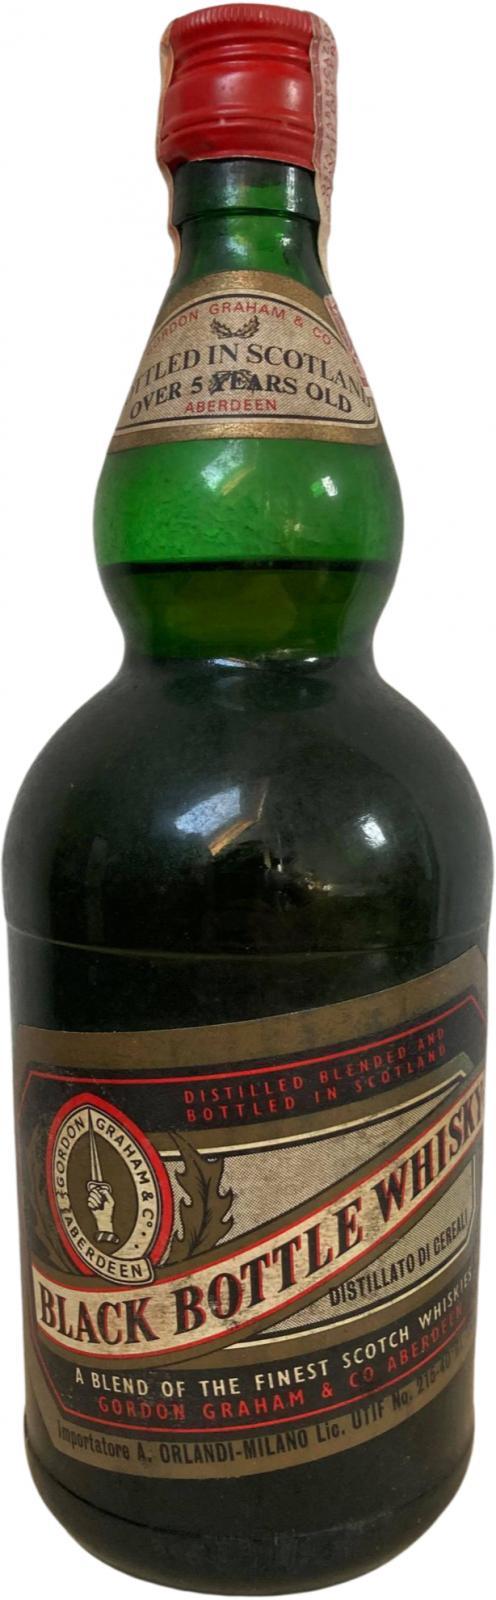 Black Bottle 05-year-old